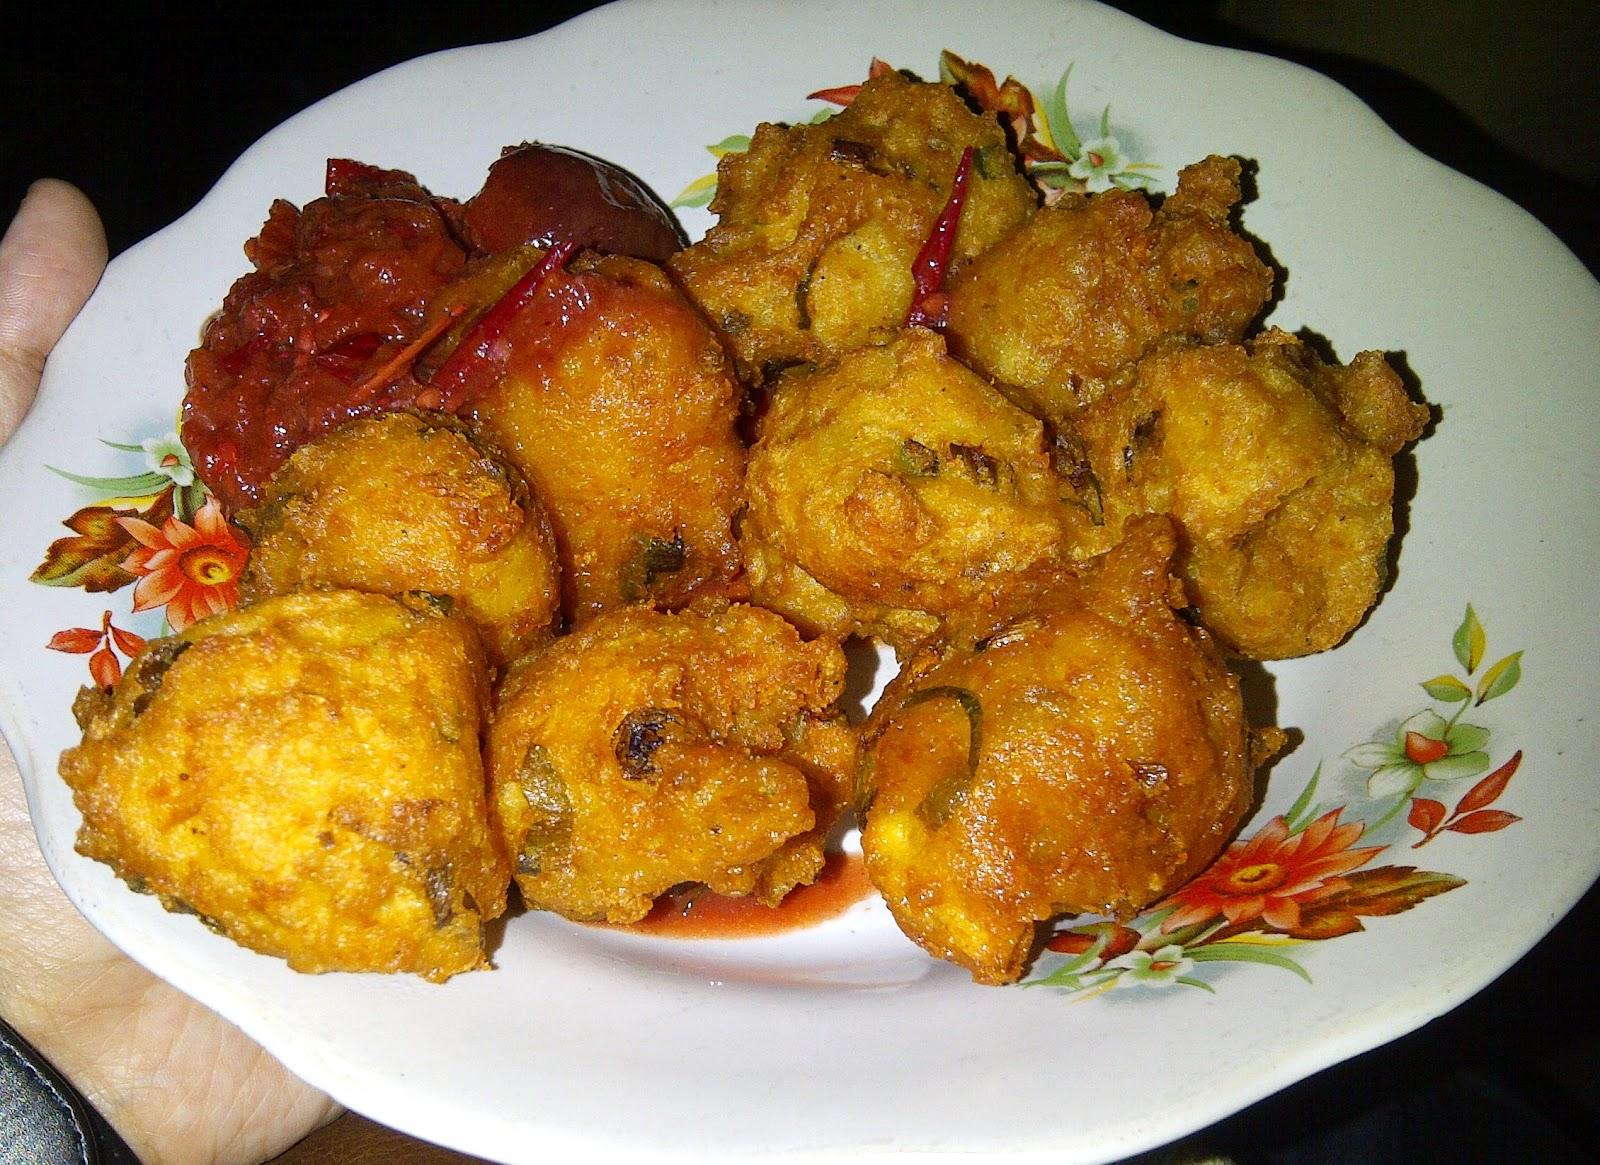 7 Kuliner Di Bandung Yang Bikin Lidah Bergoyang Gak Nyicip Rugi